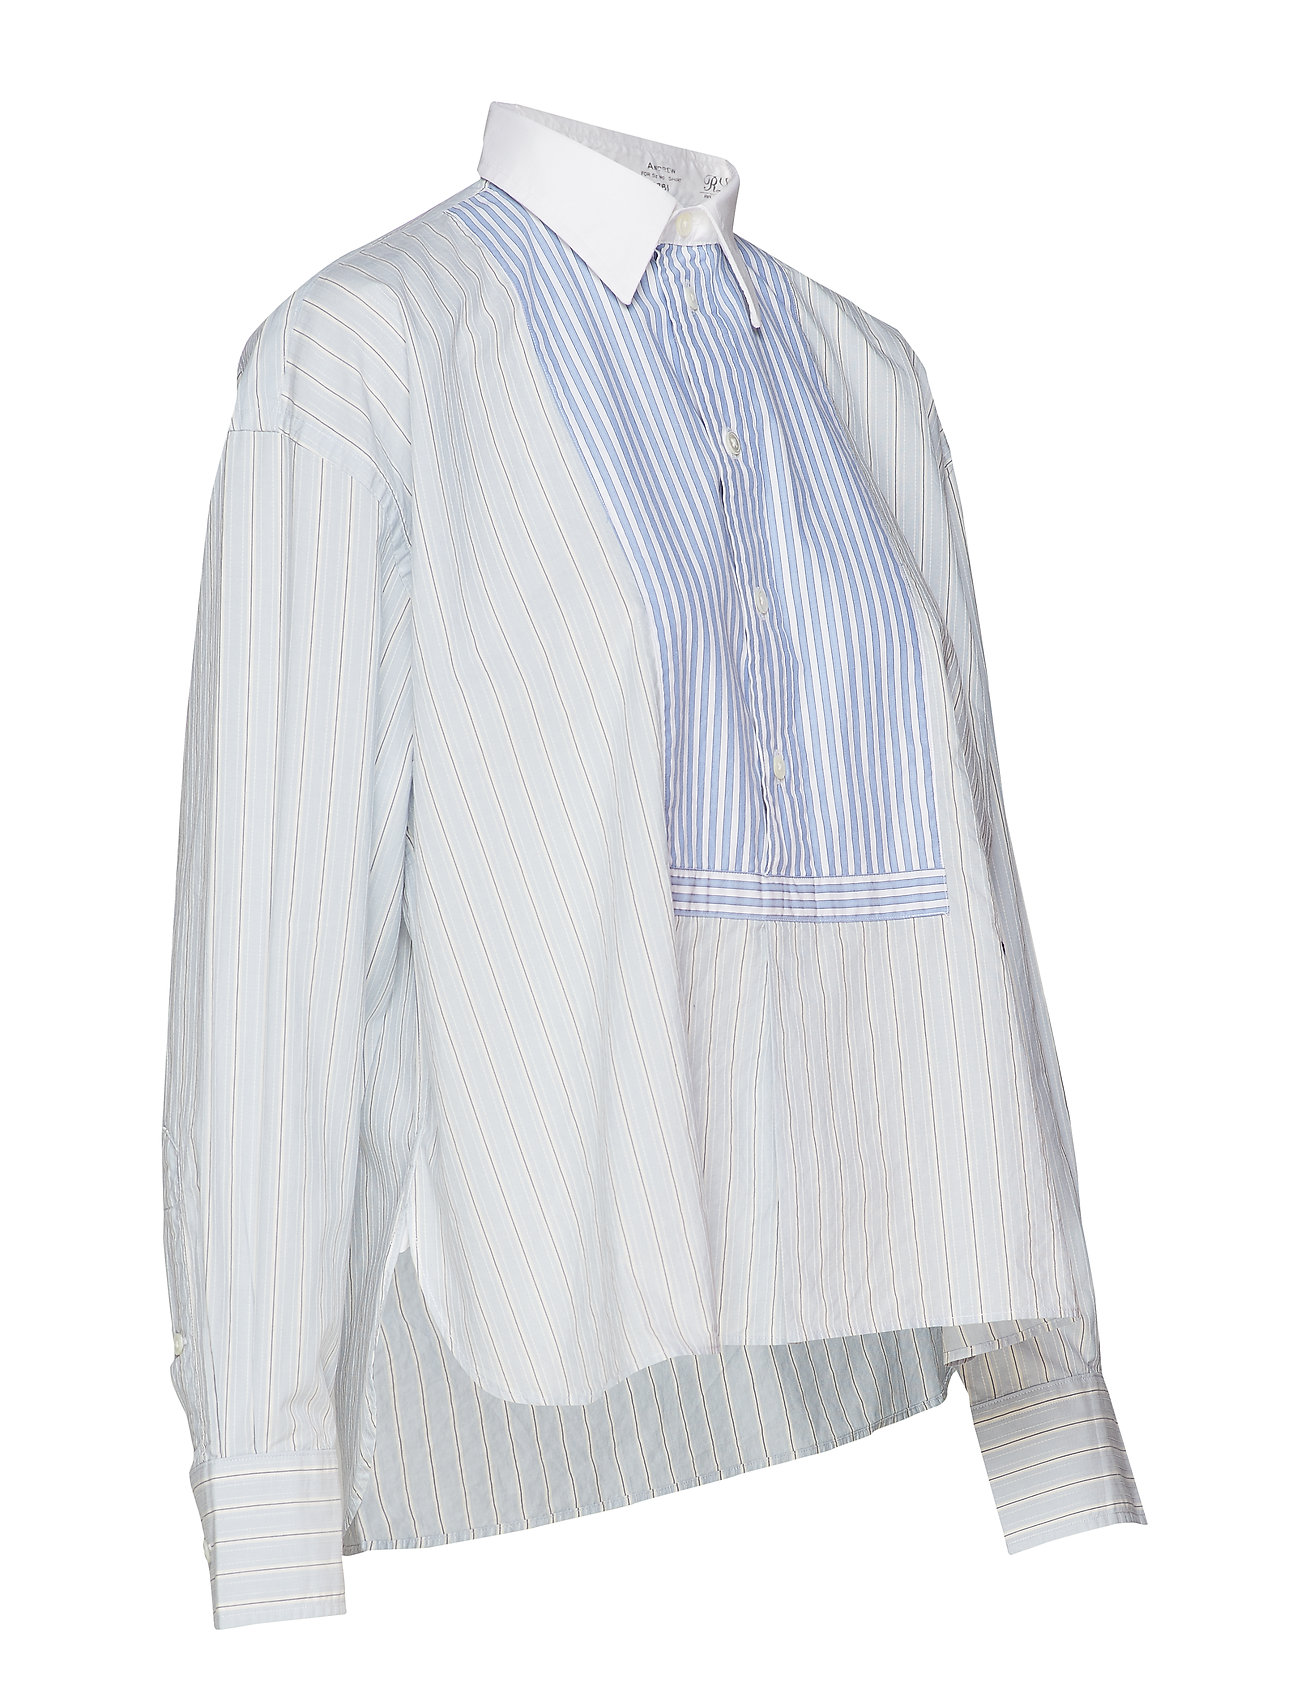 Shirt212 wPolo Lauren Striped Blue Boxy Fit Ralph Medium D2EIH9